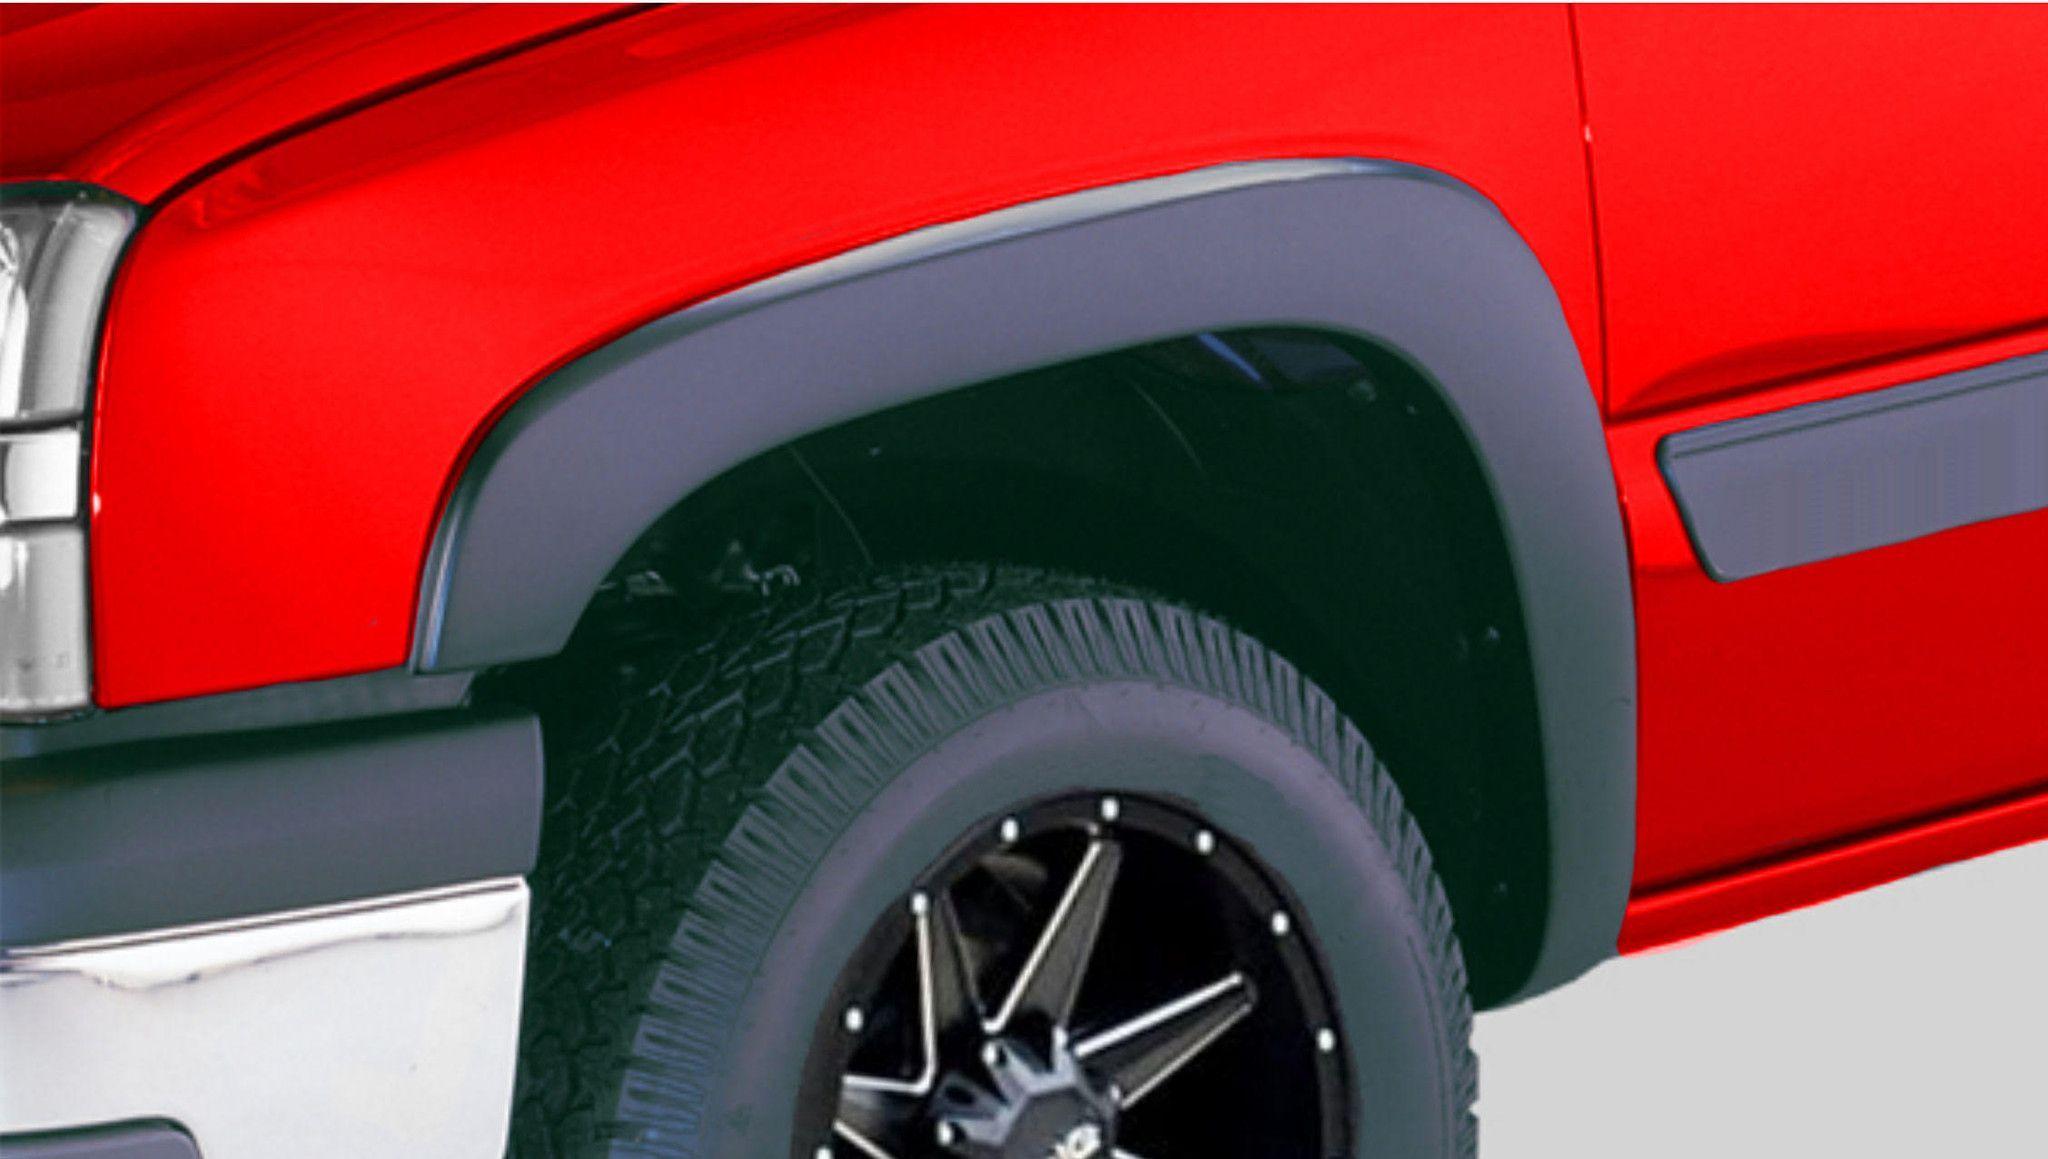 medium resolution of fender flares fit 99 06 chevrolet avalanche suburban and gmc sierra yukon xl set of 4 paintable matte black